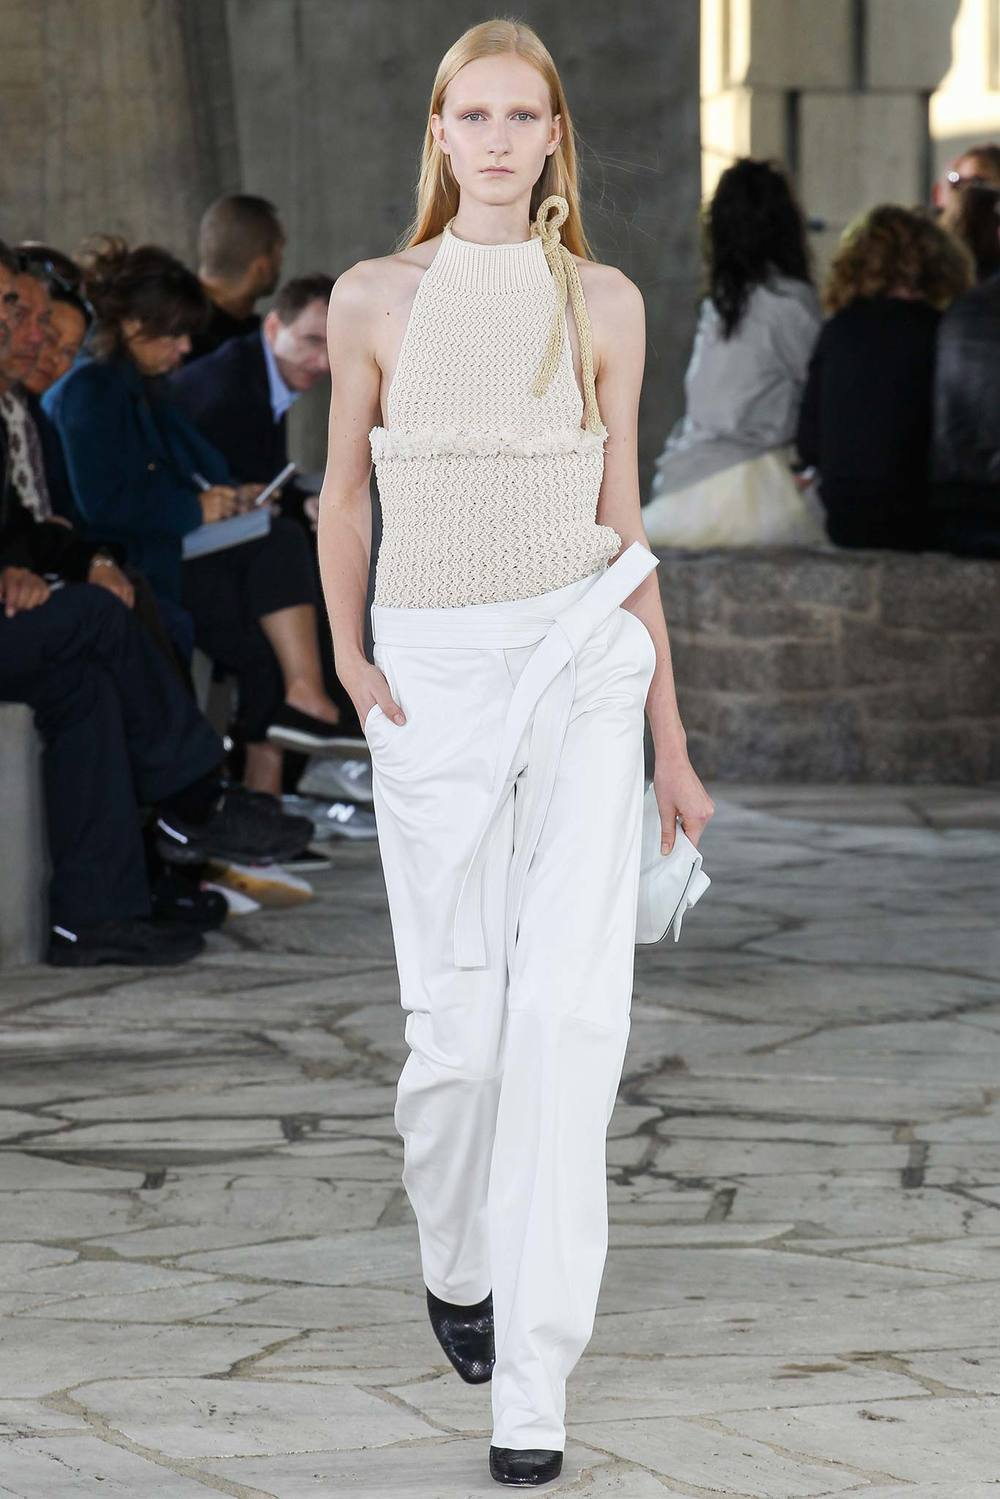 Loewe s/s 2015, look 6. Source: Style.com